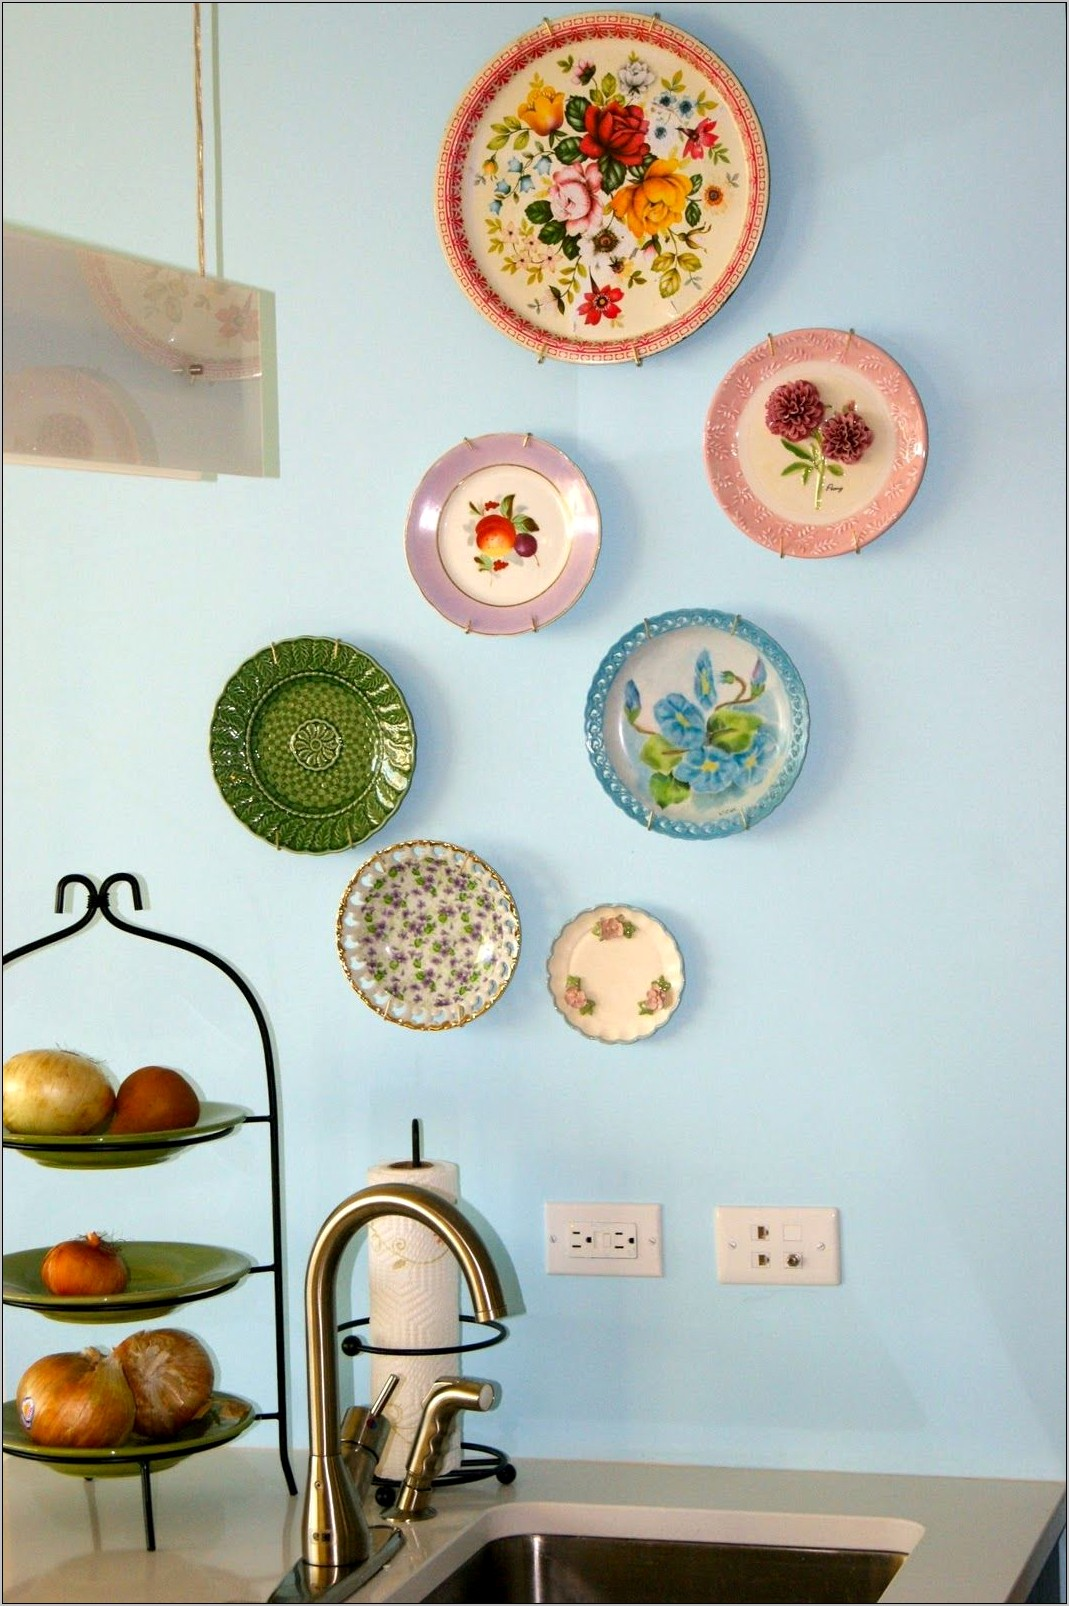 Kitchen Decor Wall Plates